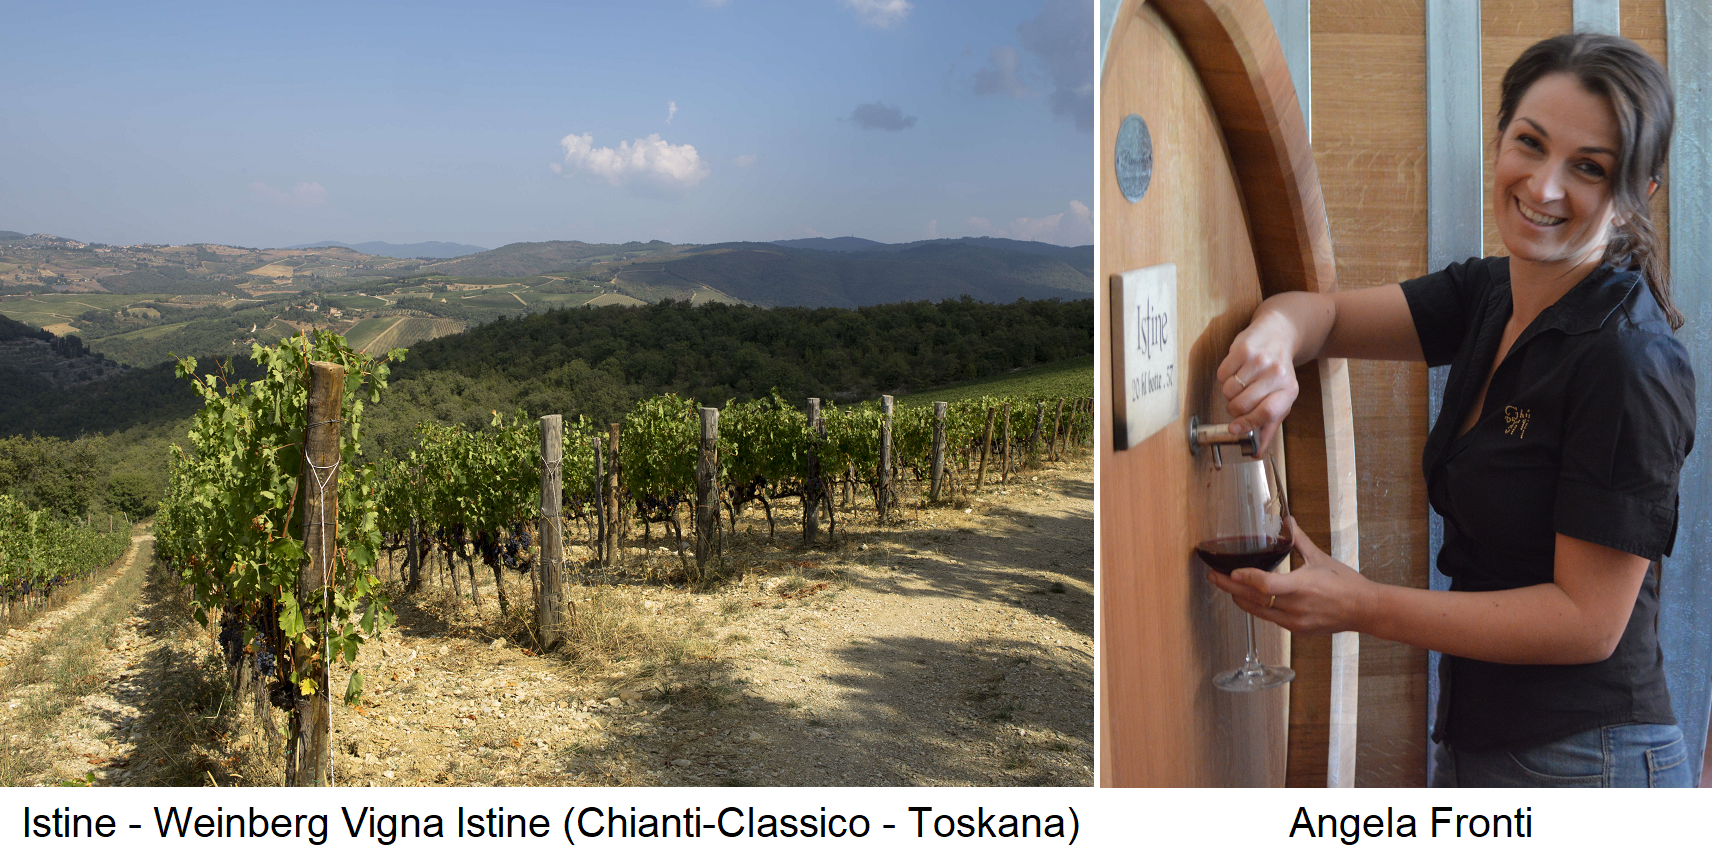 Istine - vineyard Vigna Istine (Chianti-Classico in Tuscany) and Angela Fronti